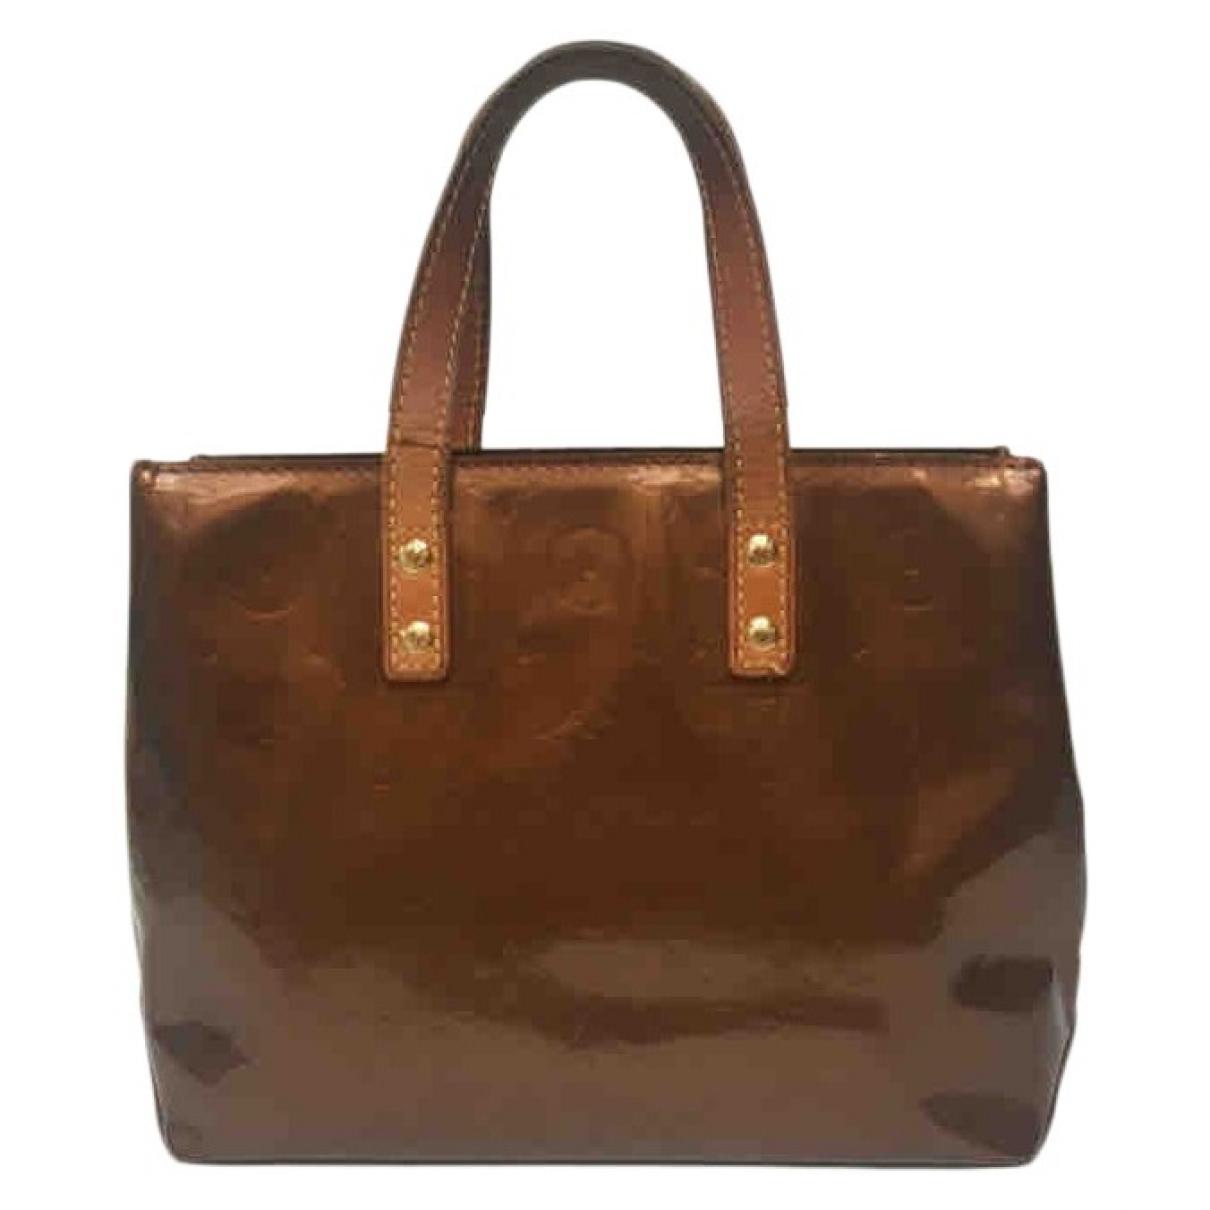 Louis Vuitton Reade Brown Patent leather handbag for Women \N